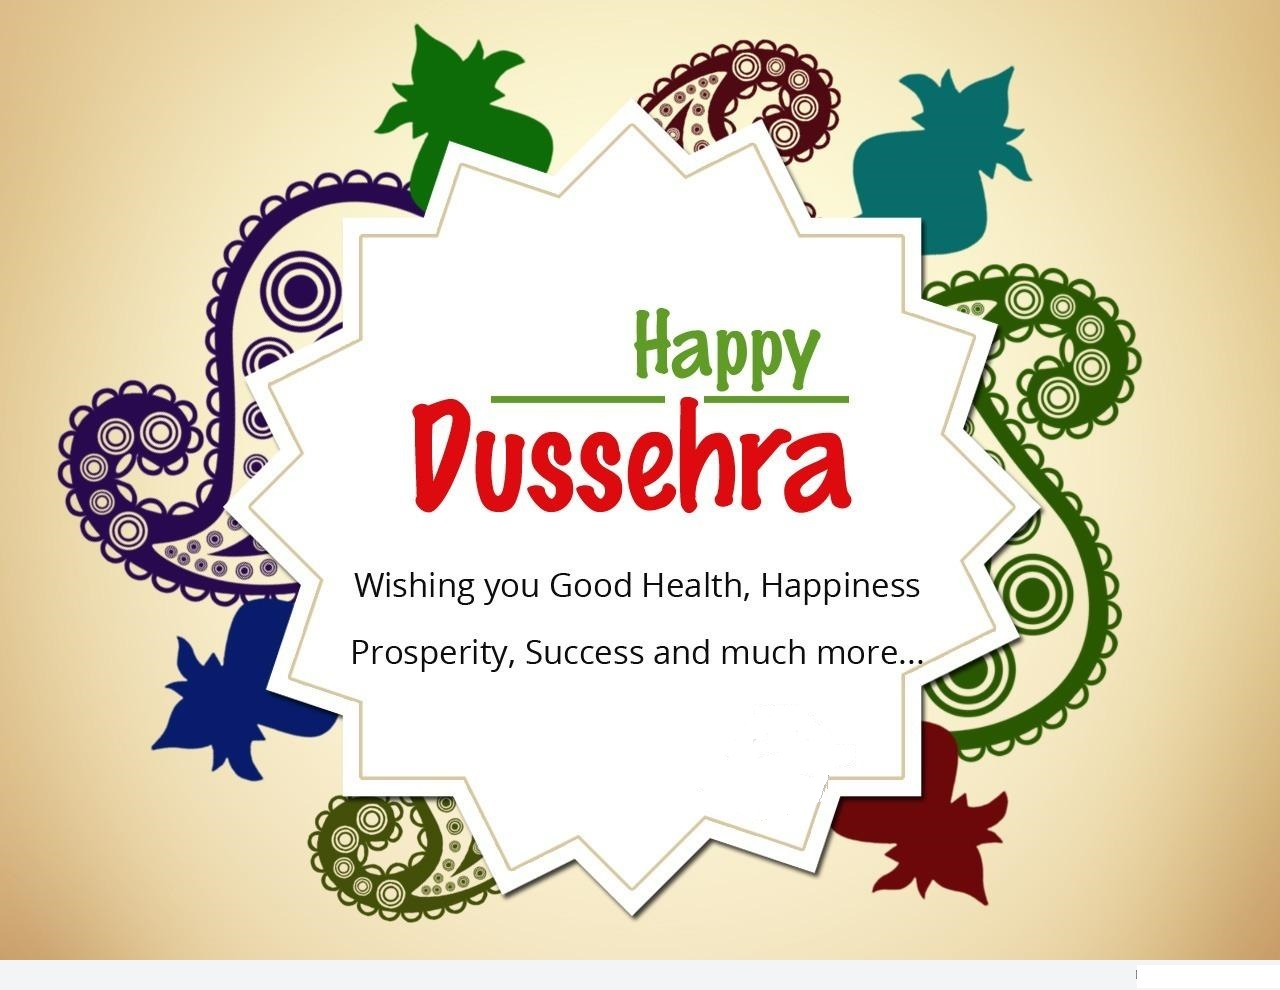 Vijayadashami Dussehra Images for Whatsapp DP Profile, HD Wallpapers-12